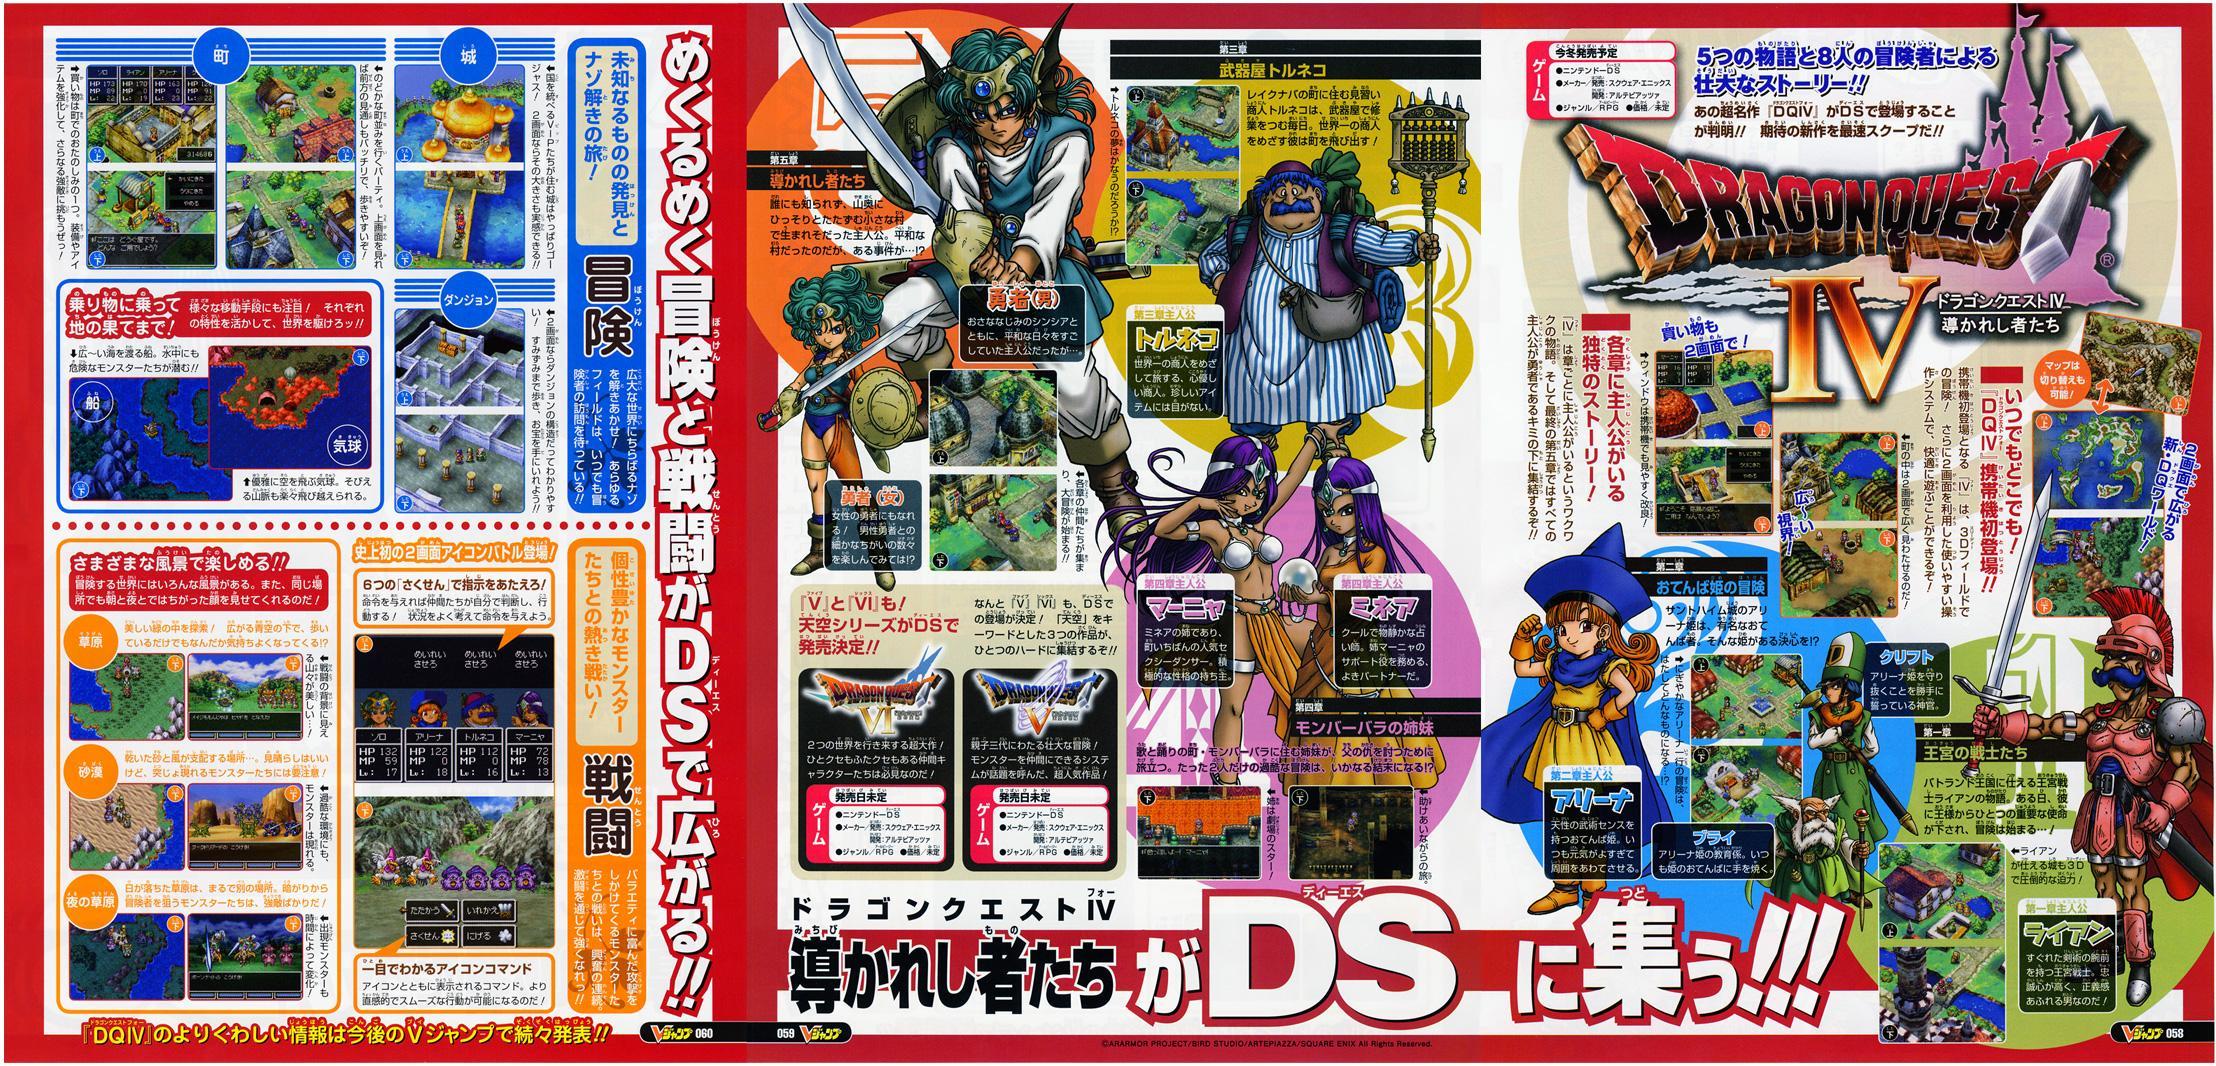 Dragon Quest IV: Un scan